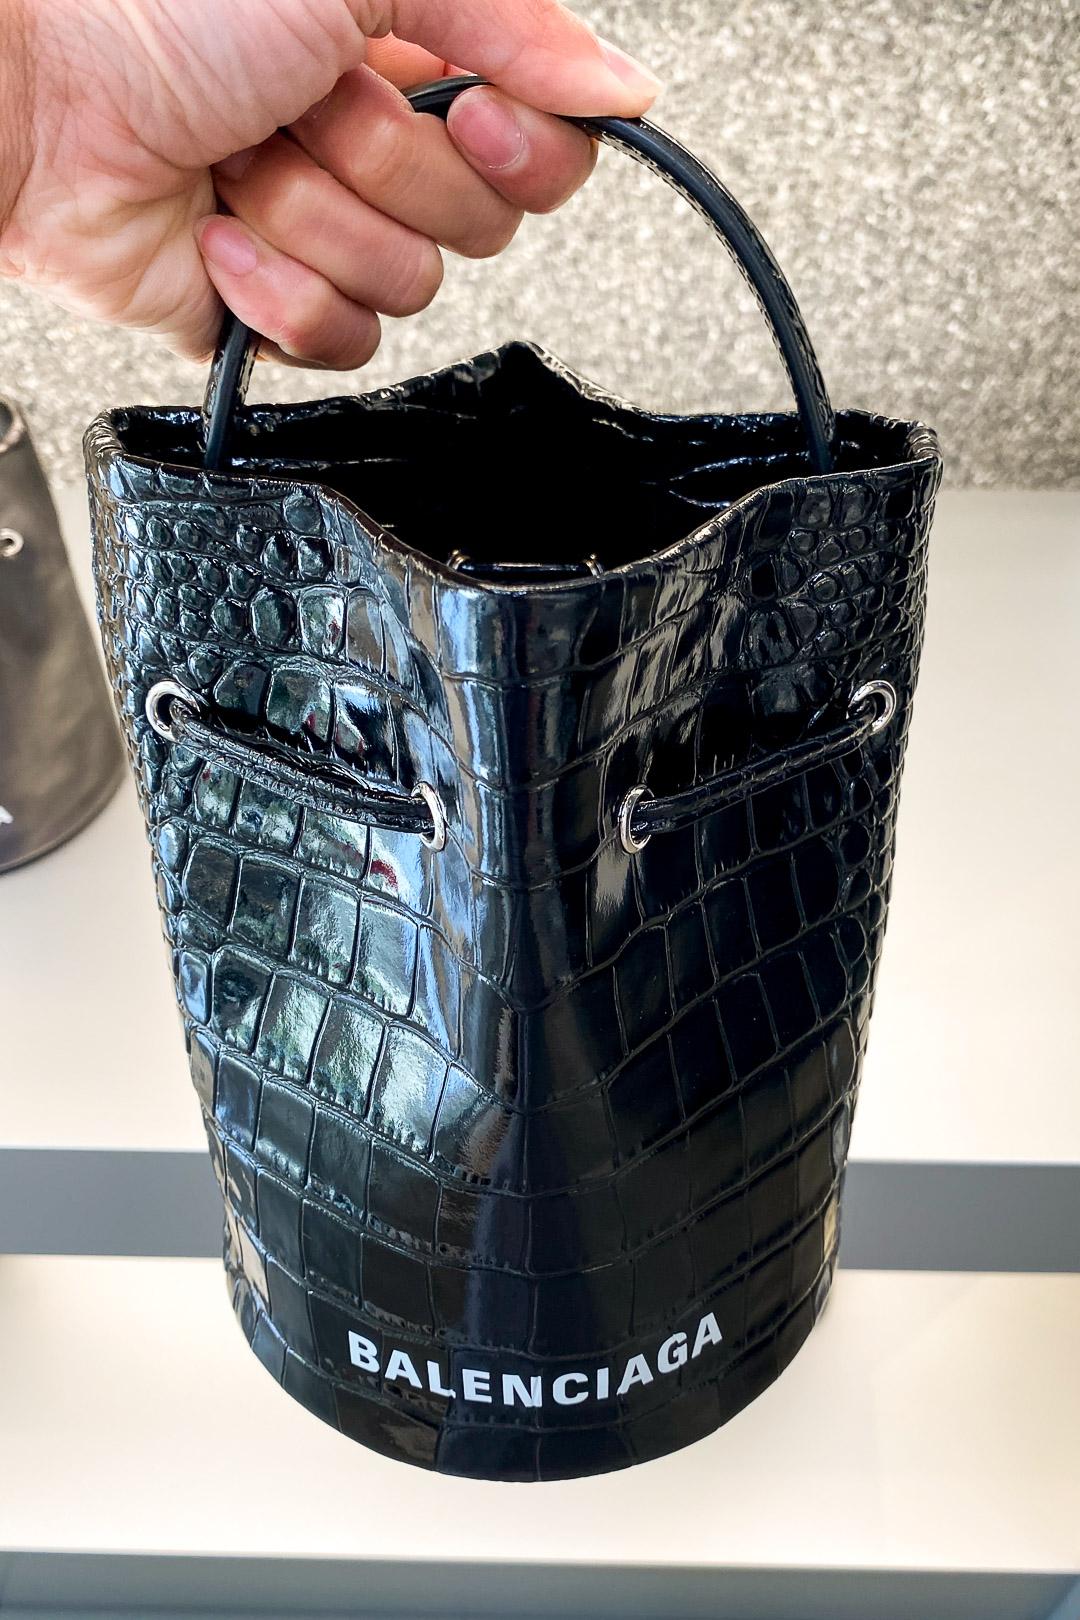 Balenciaga Women's Black Shiny Croc XS Everyday Bucket Bag